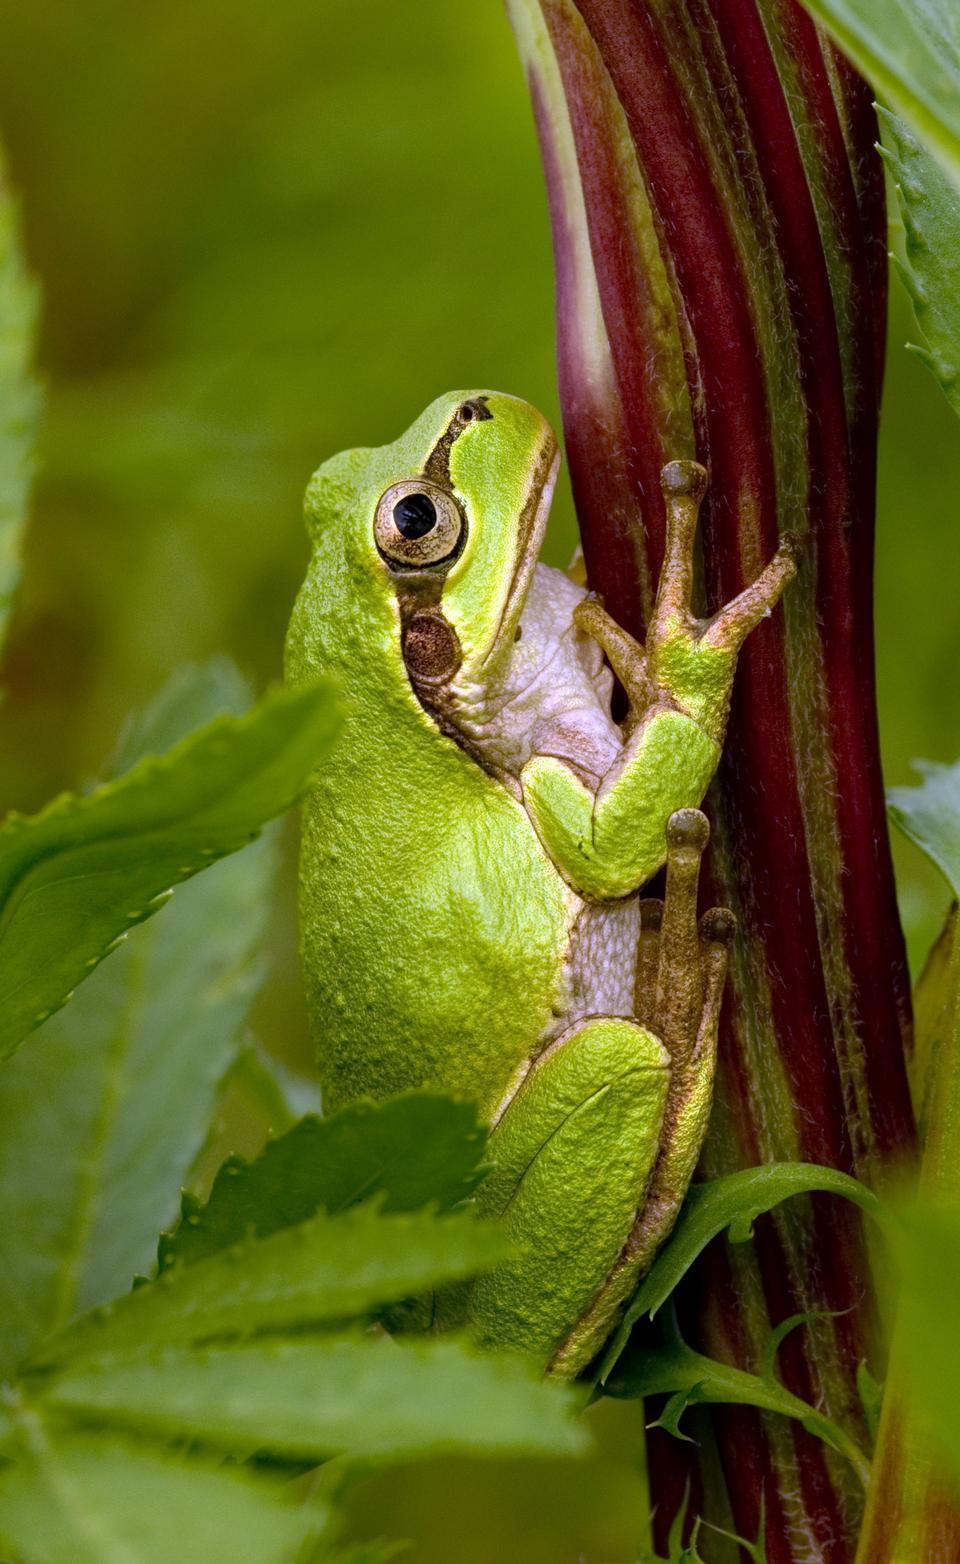 tree-frog-hiding-in-green-background-leafs-Agalychnis--10211363D018416F.jpg